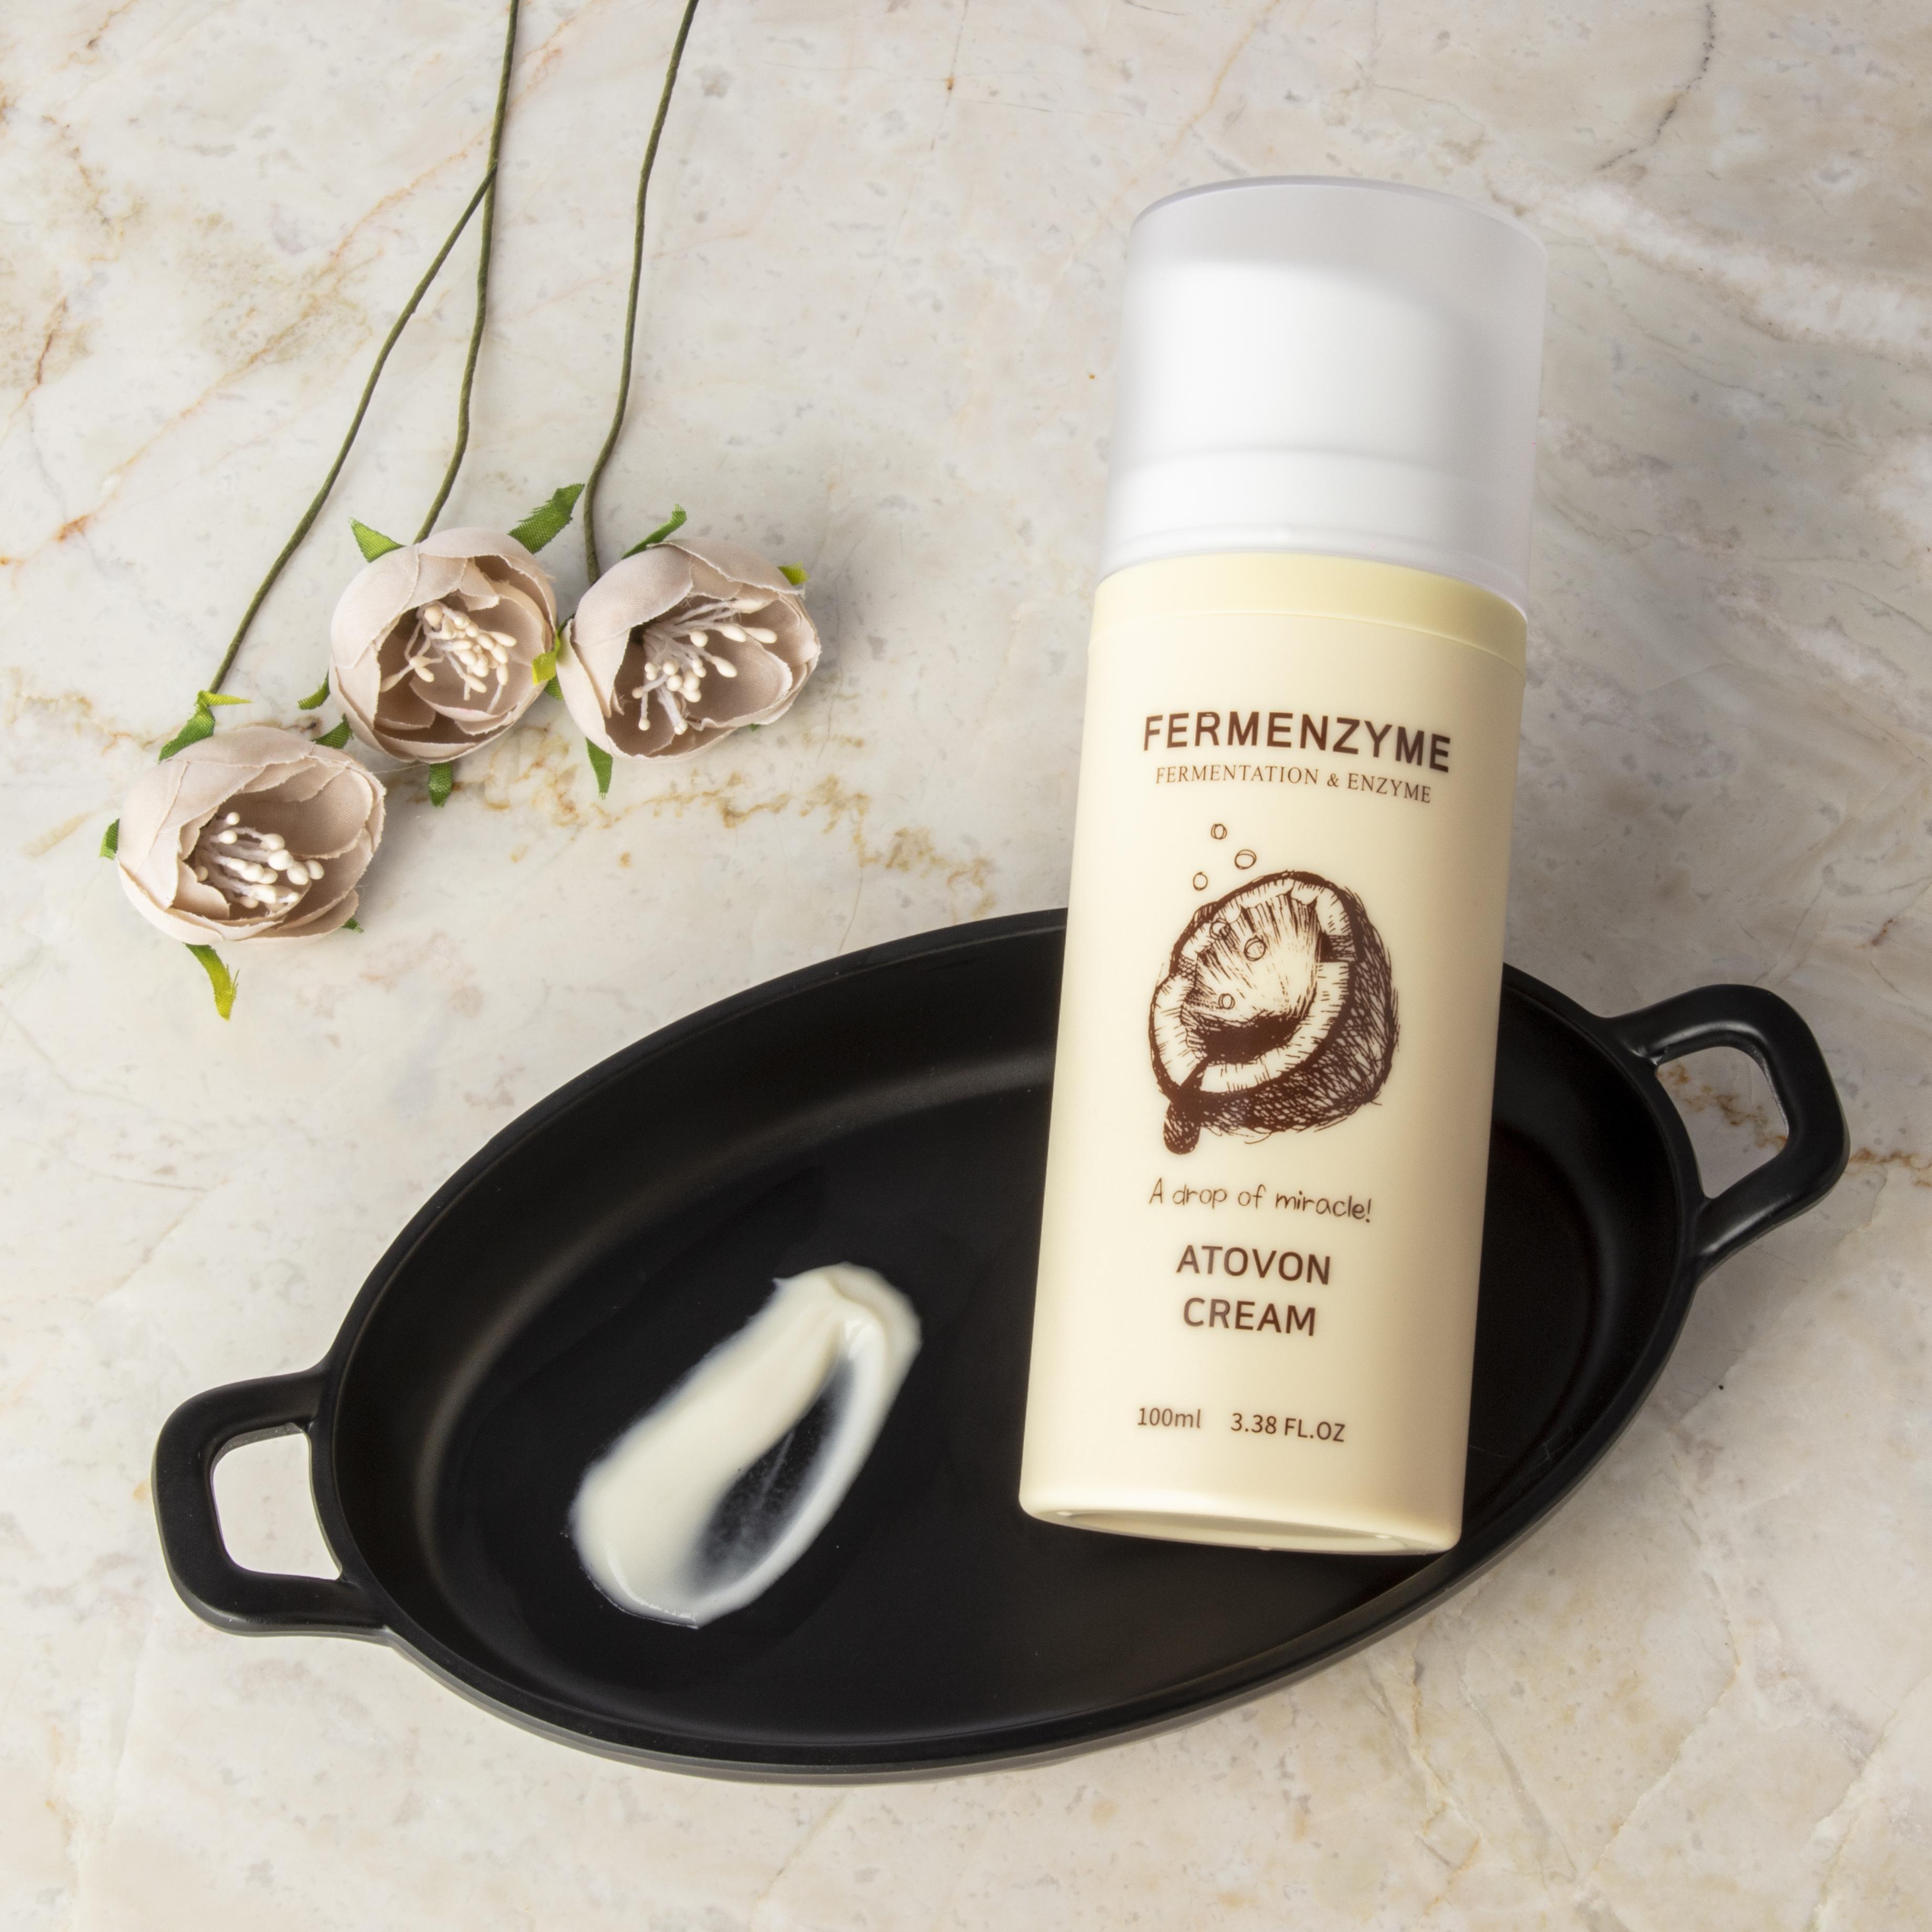 Fermenzyme Atovon Cream